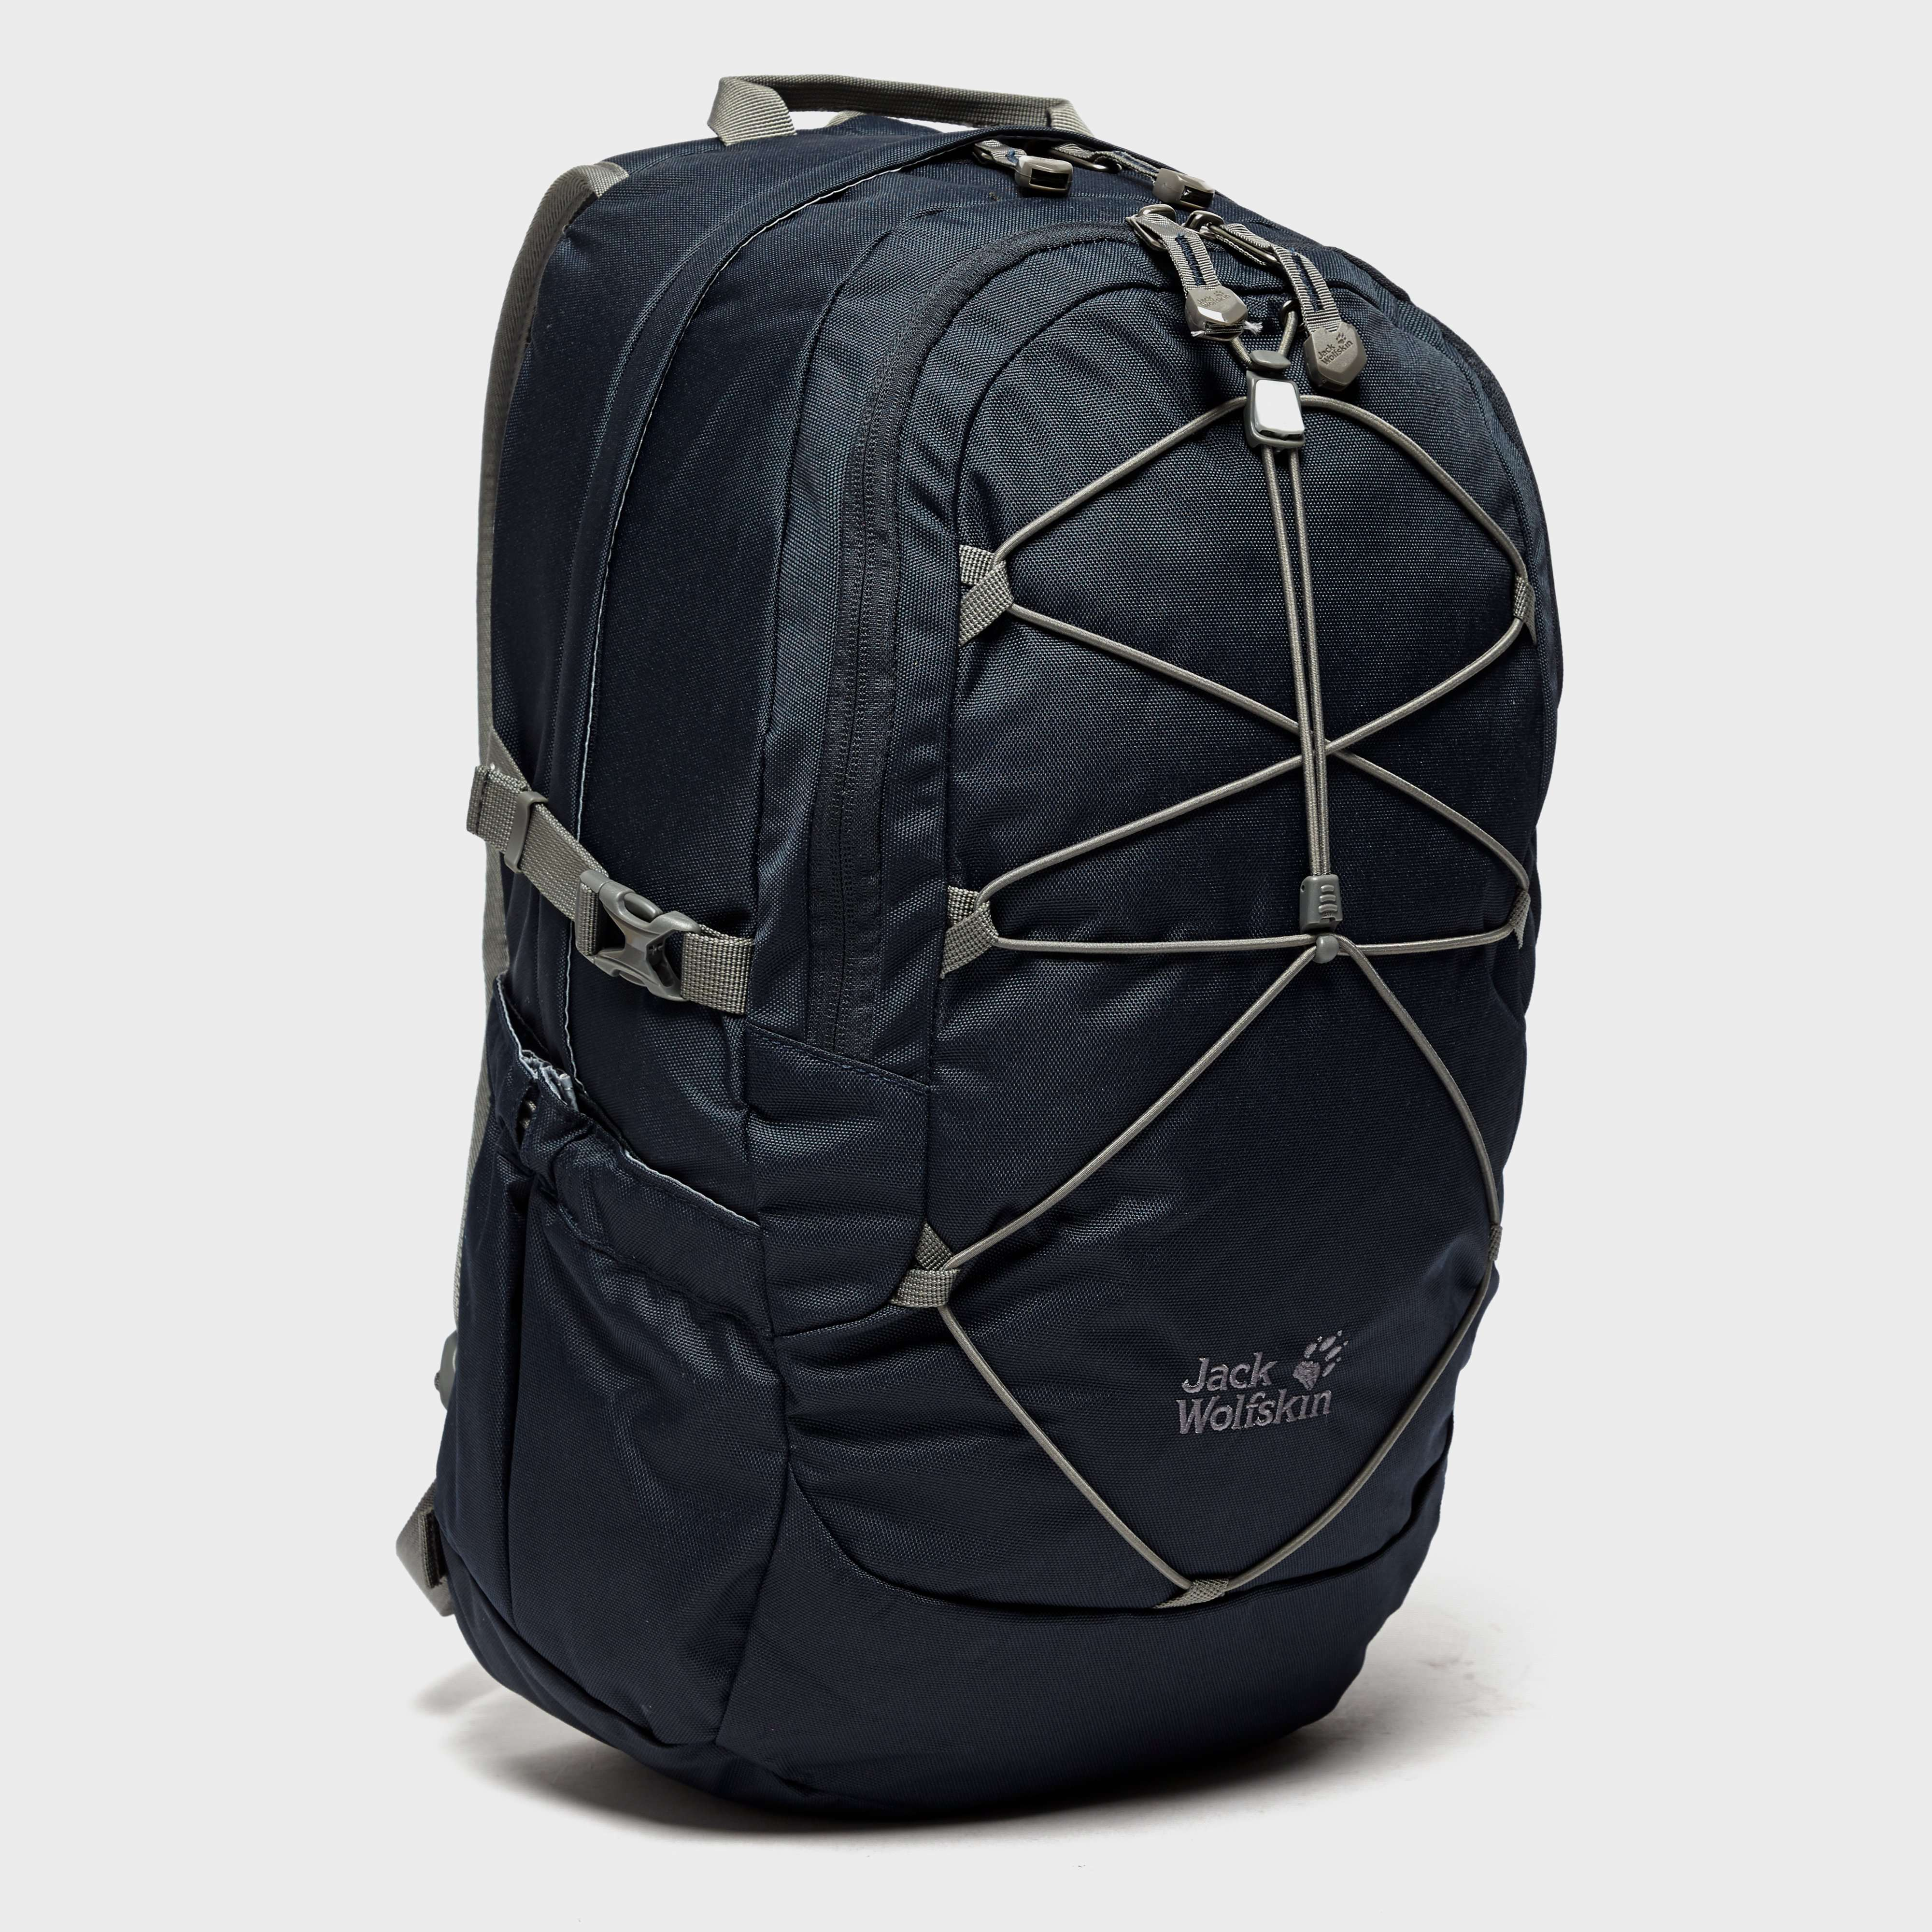 JACK WOLFSKIN Daytona 30 Litre Backpack